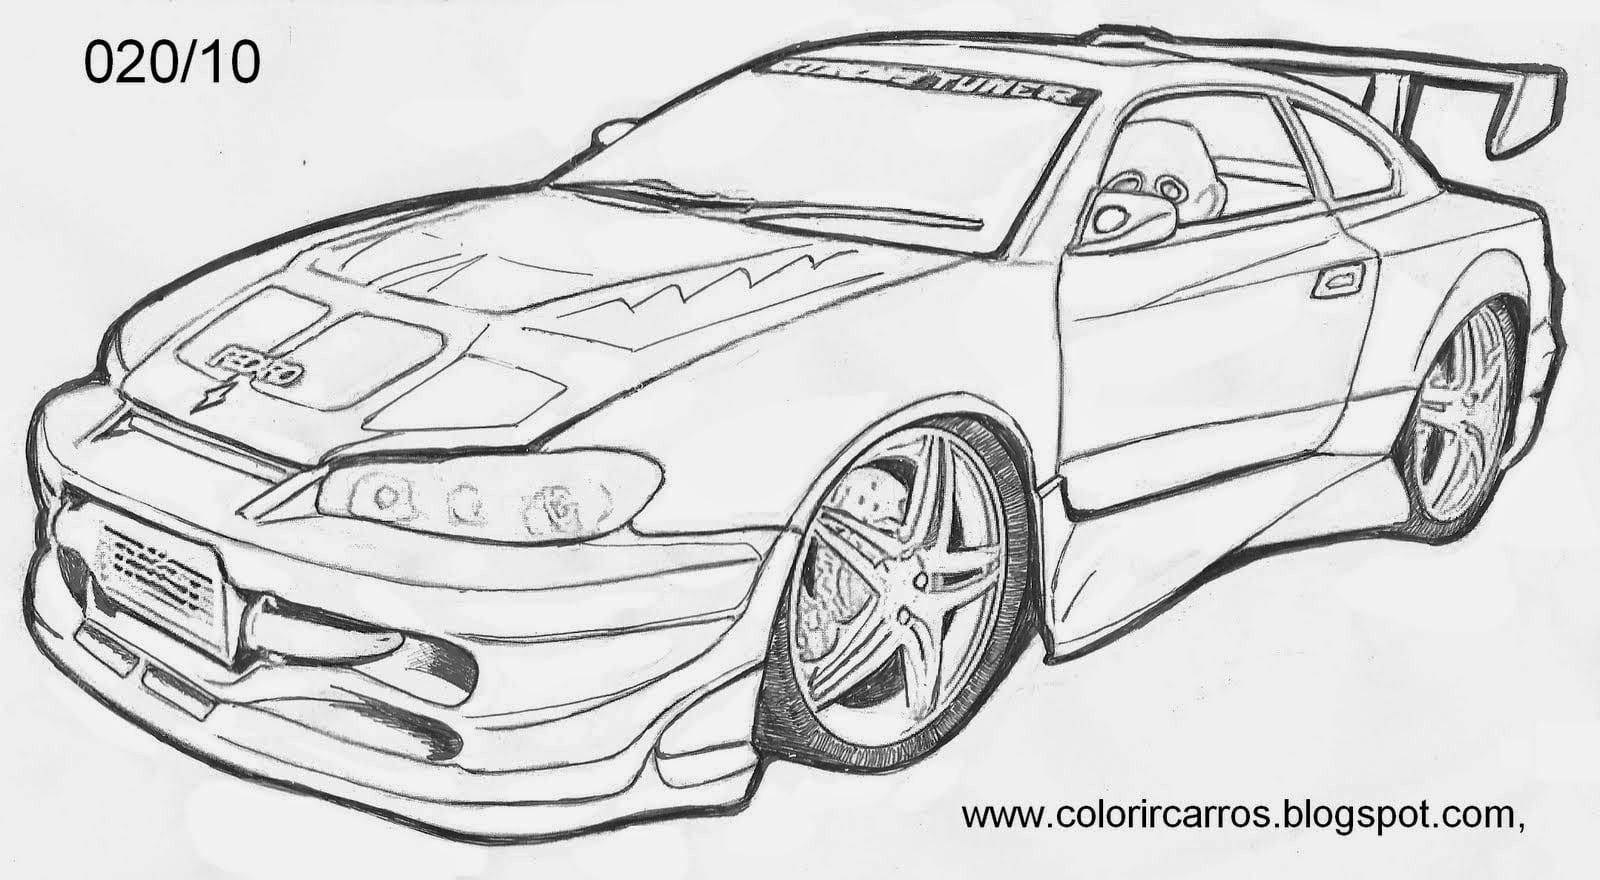 Bonito Chevy Camaro Para Colorear Motivo - Dibujos de Animales para ...